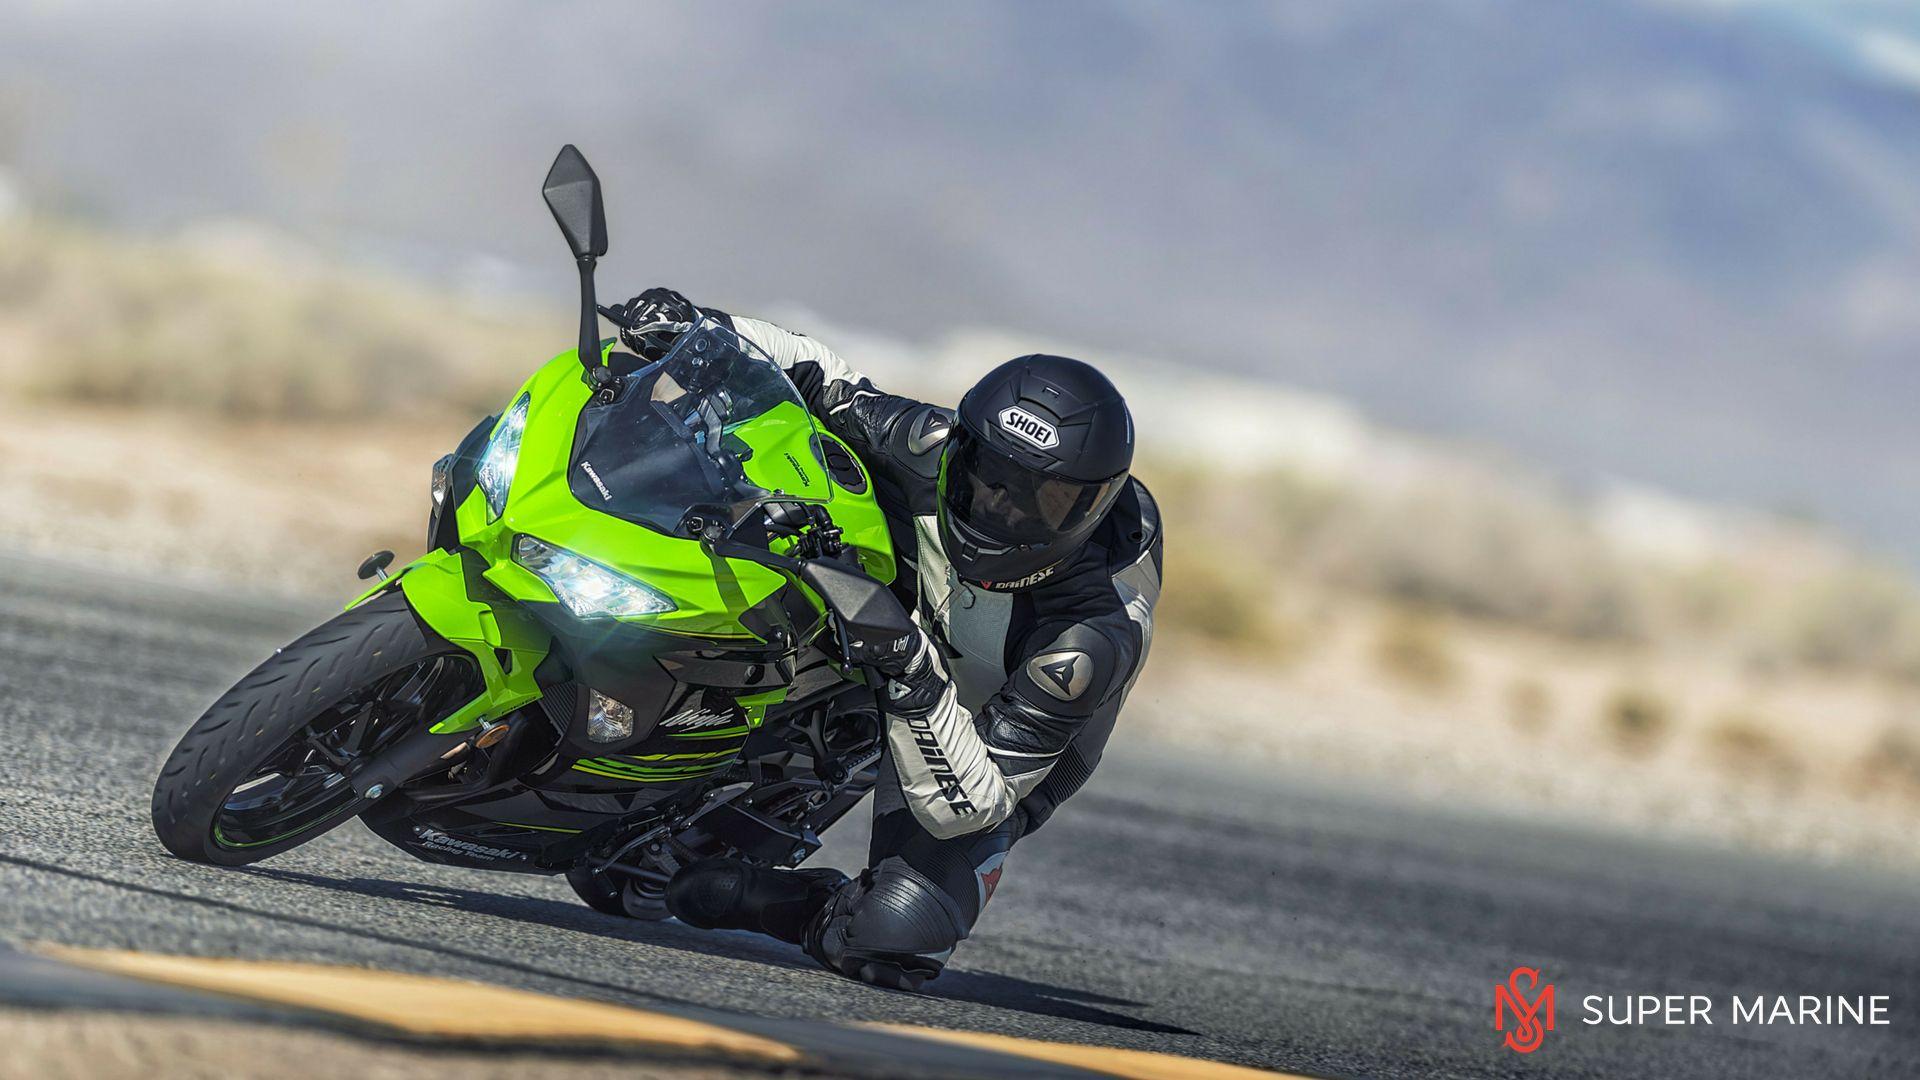 Мотоцикл Kawasaki Ninja 400 Зеленый 2020 - 8